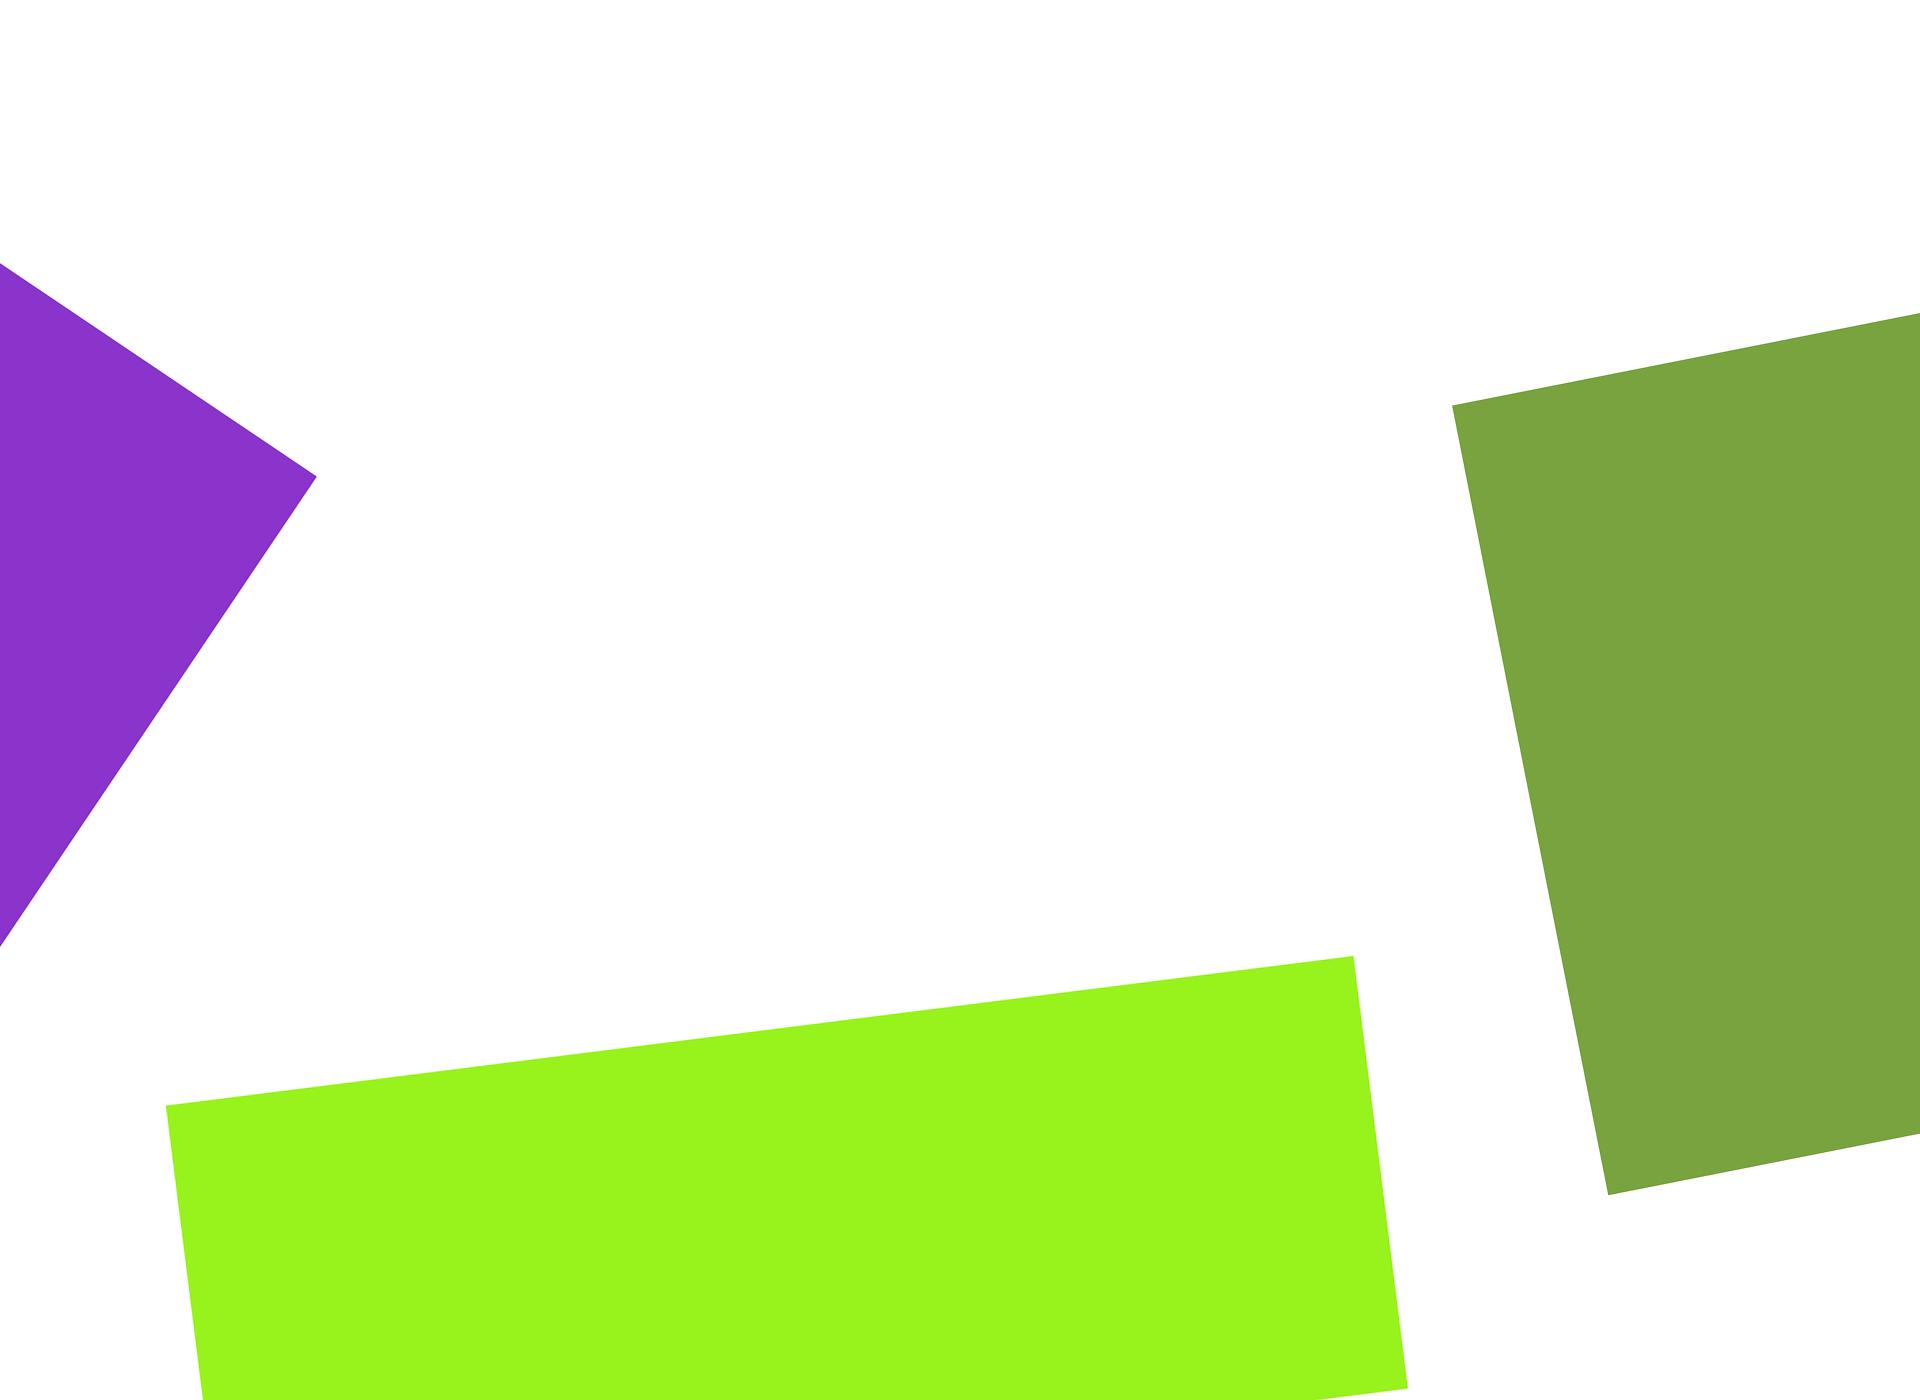 parallax layer